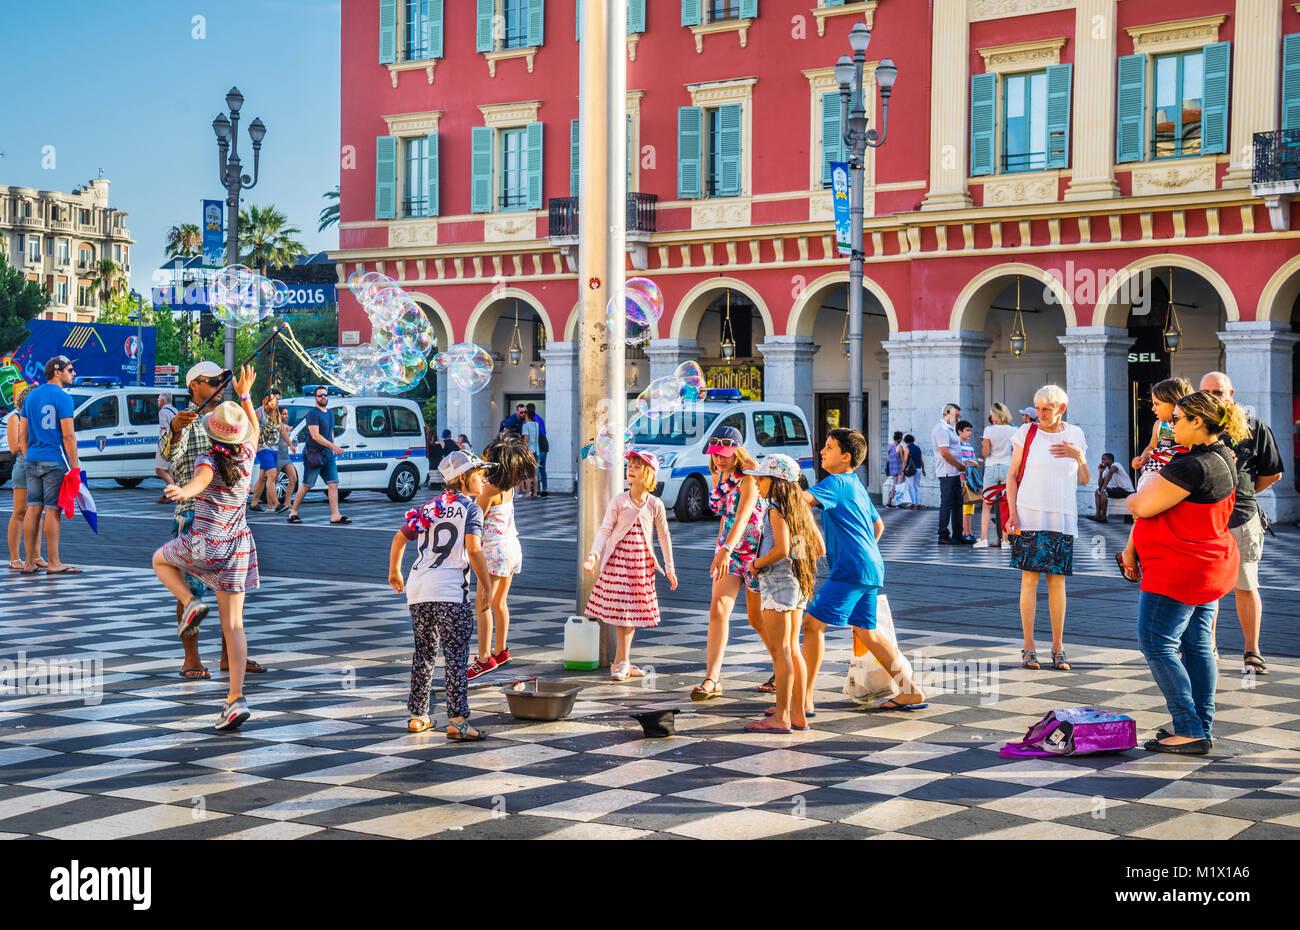 France, Alpes-Maritimes department, Côte d'Azur, Nice, soap bubble fun on historic Place Masséna with - Stock Image